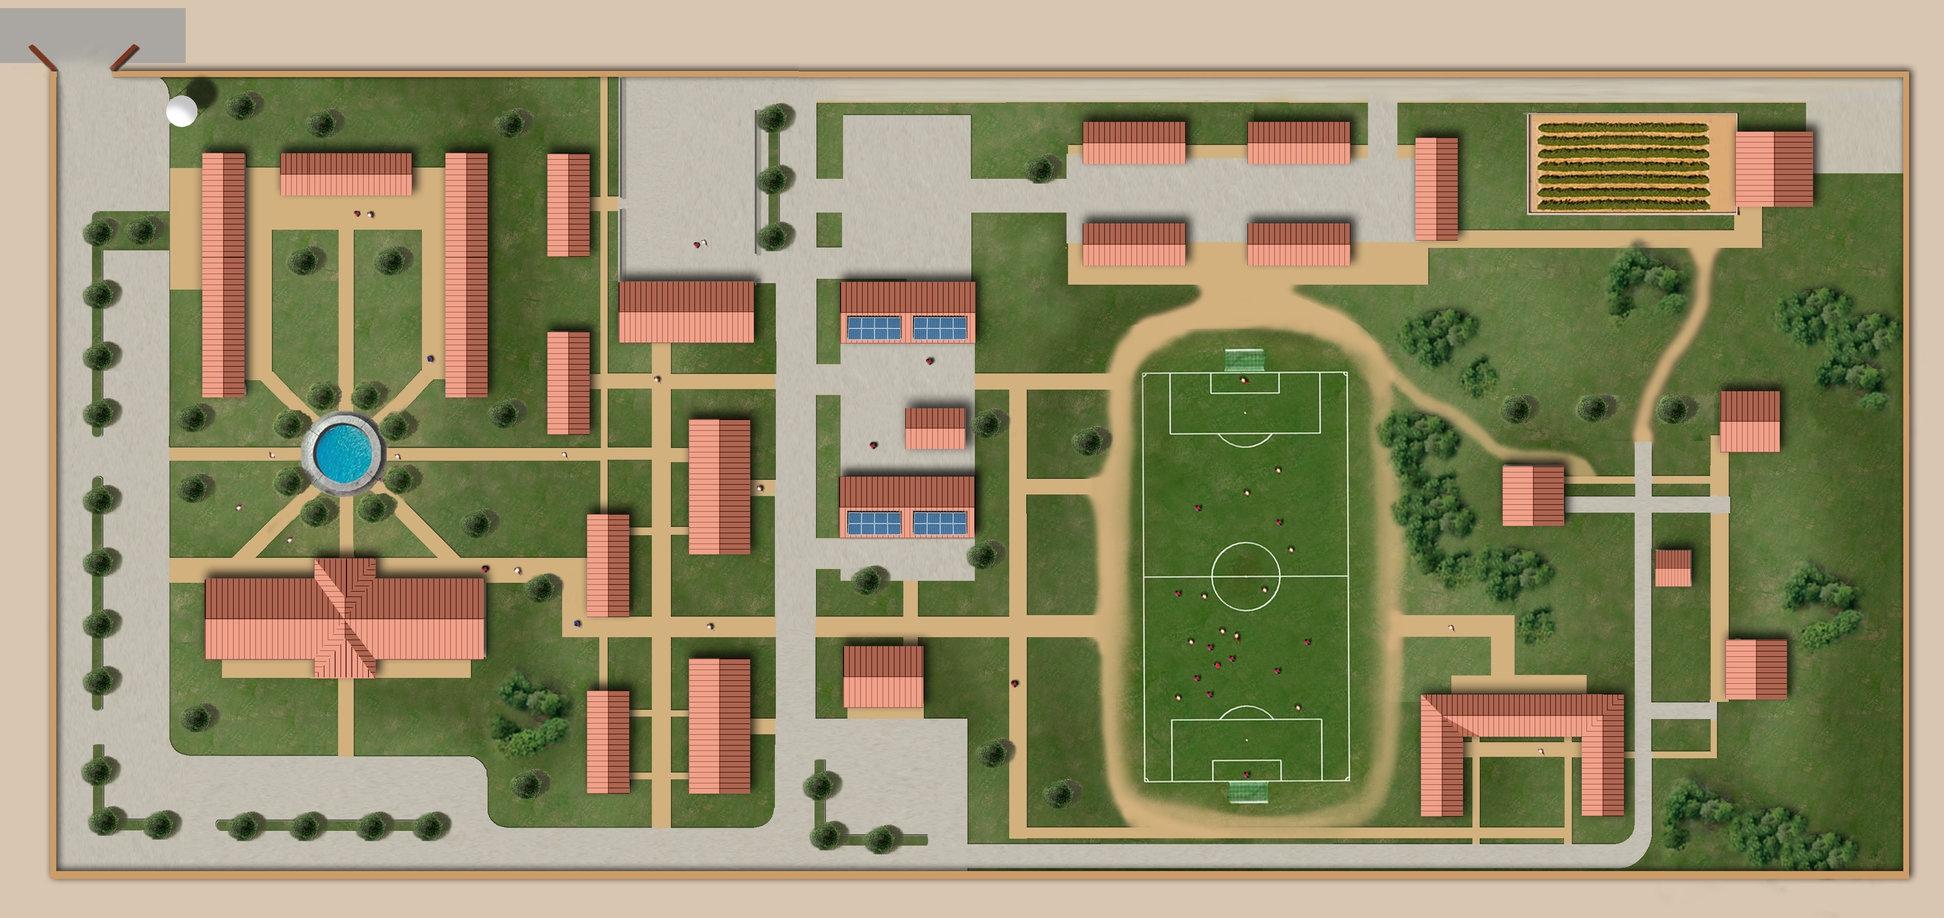 West African Vocational Schools Antula Campus